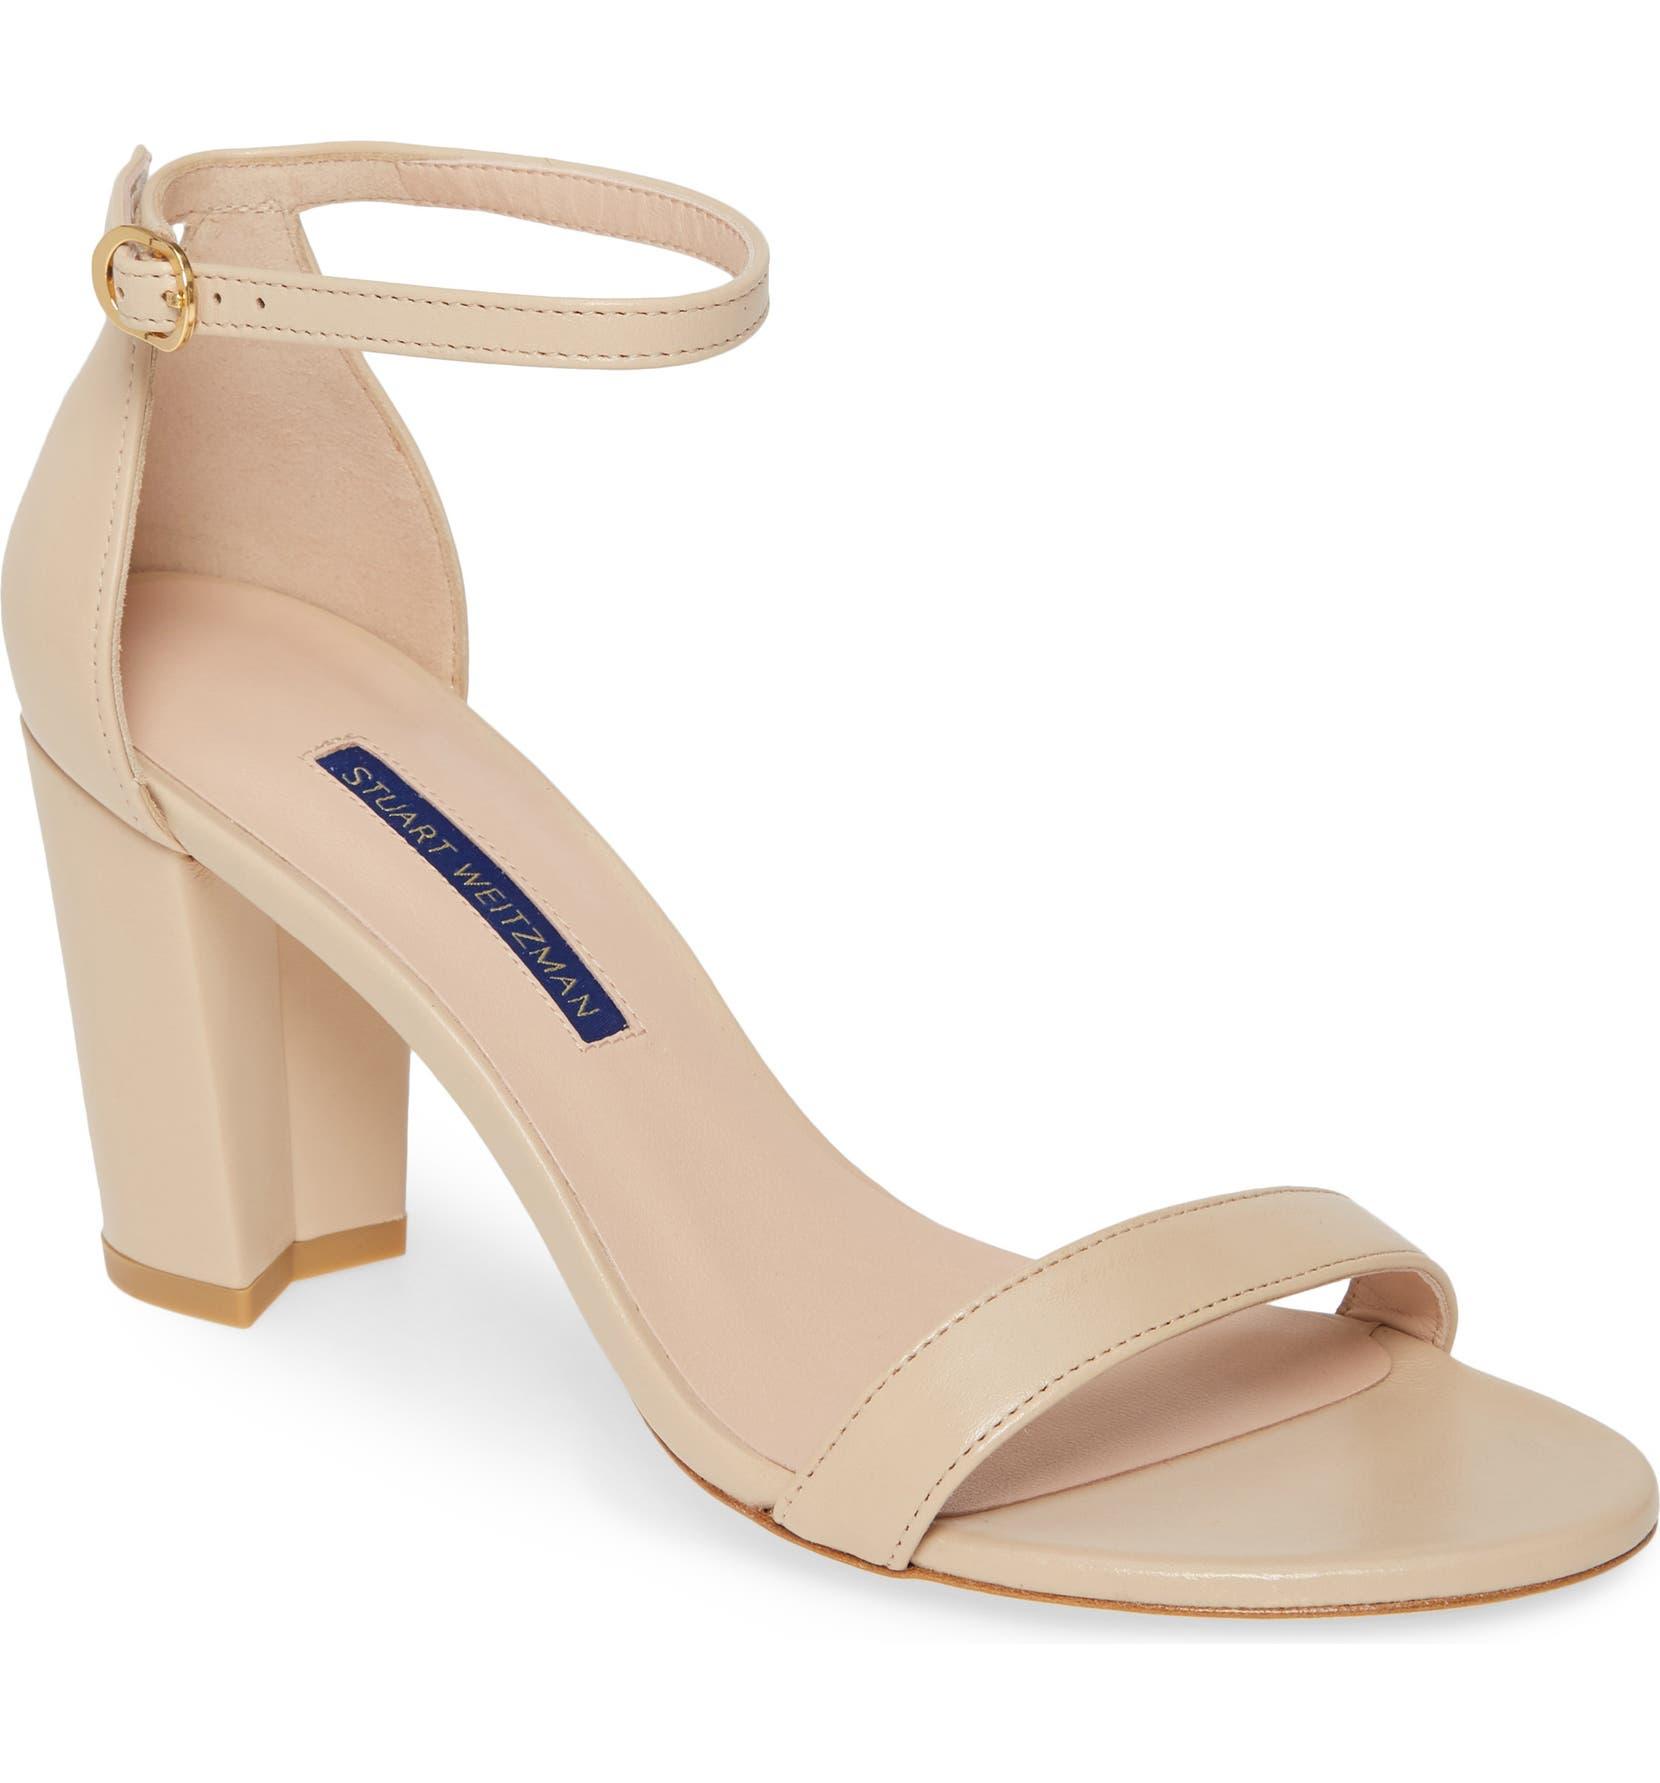 e1640adb3d3 NearlyNude Ankle Strap Sandal